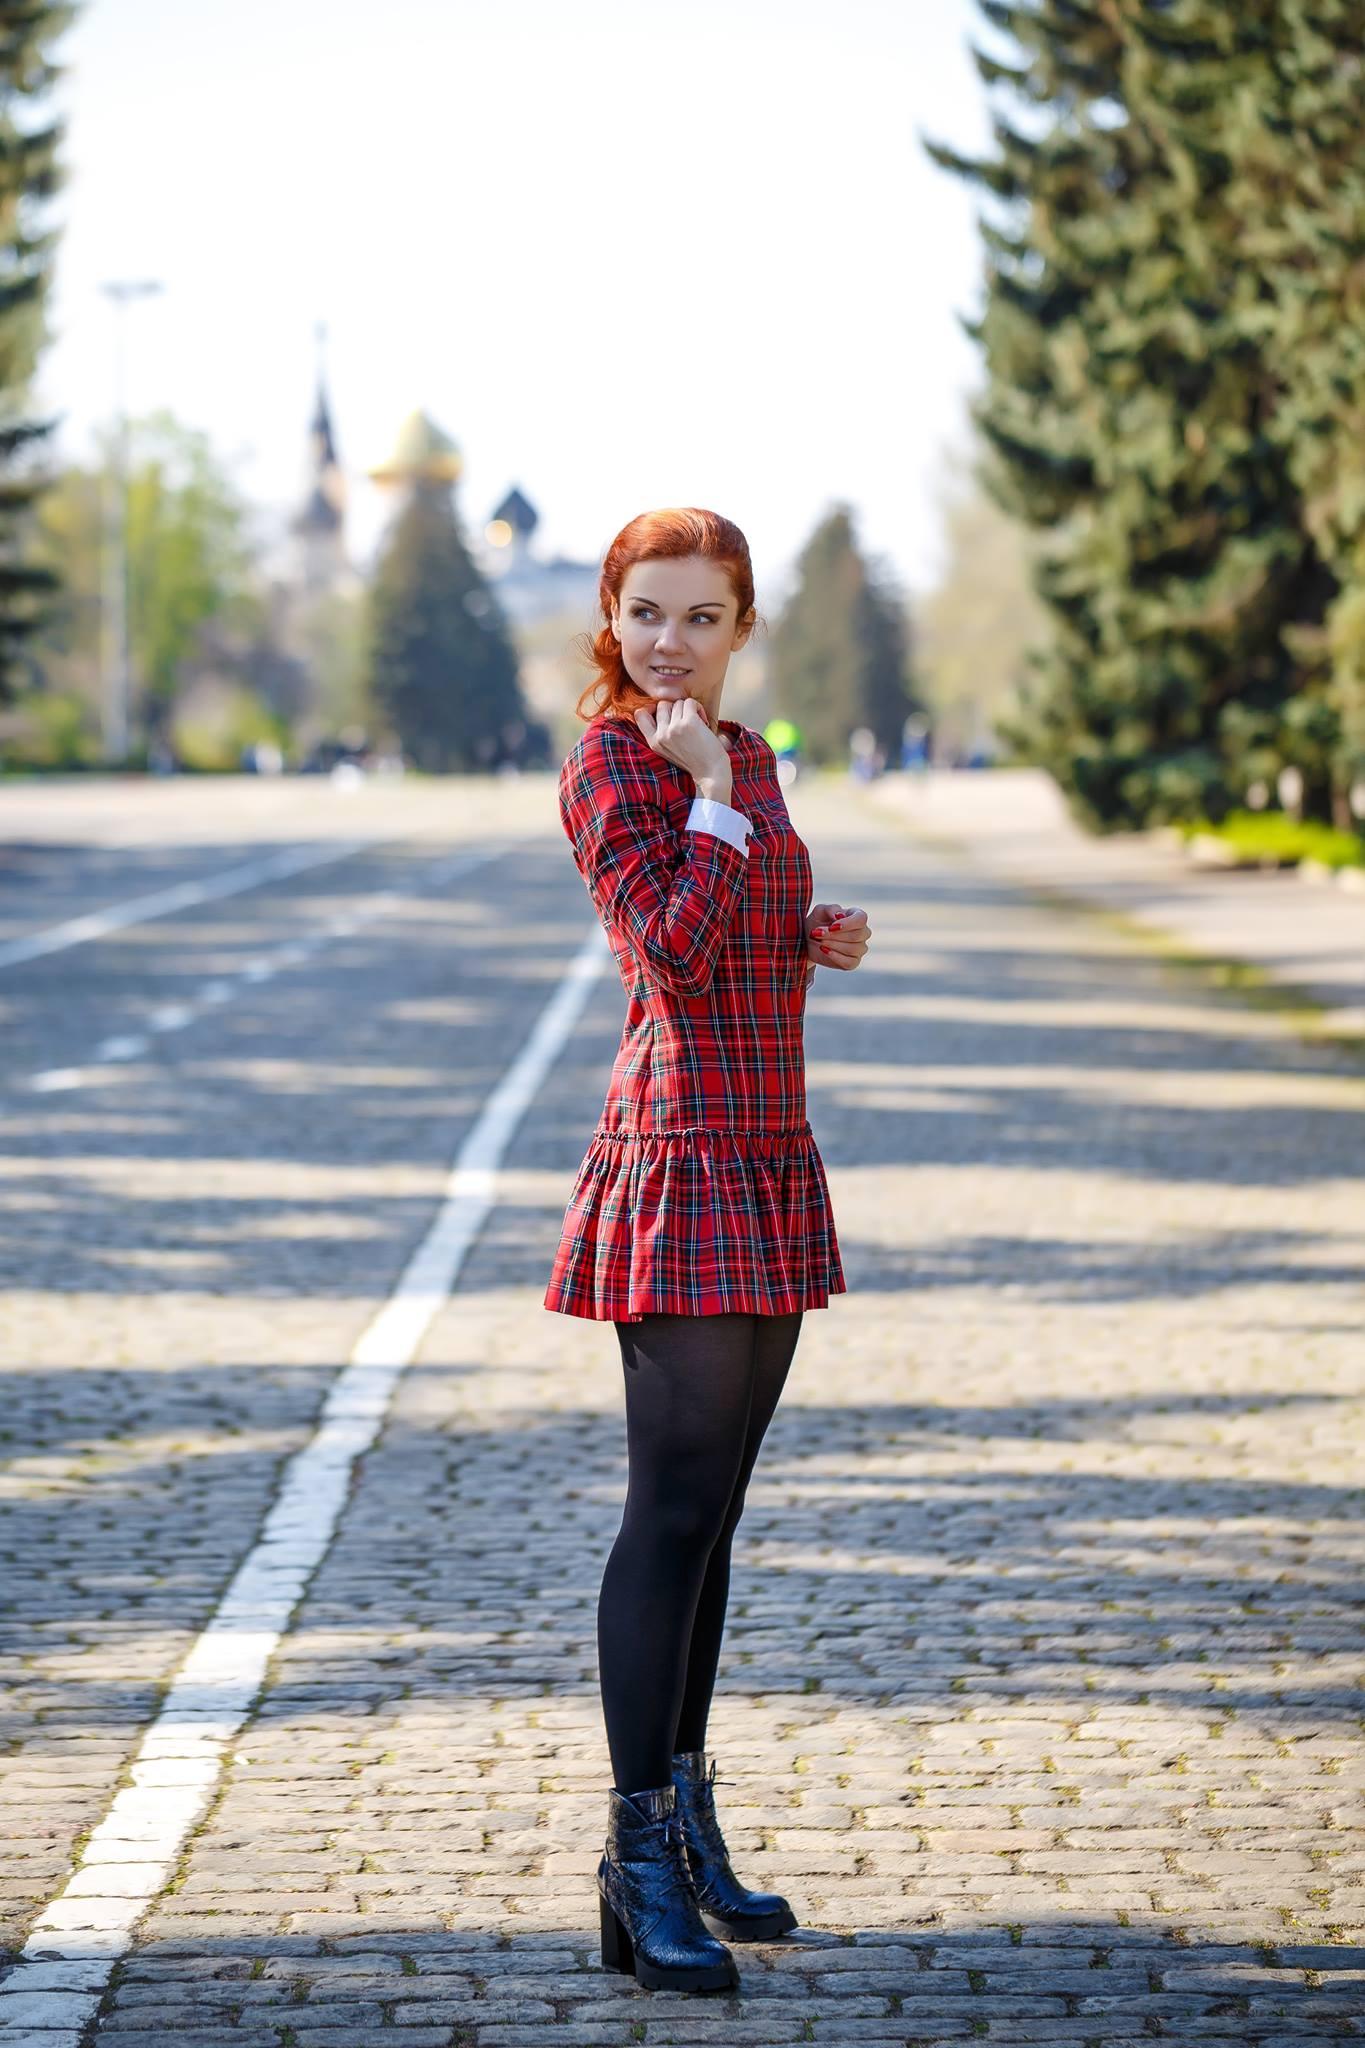 natalie ukraine 2.jpg